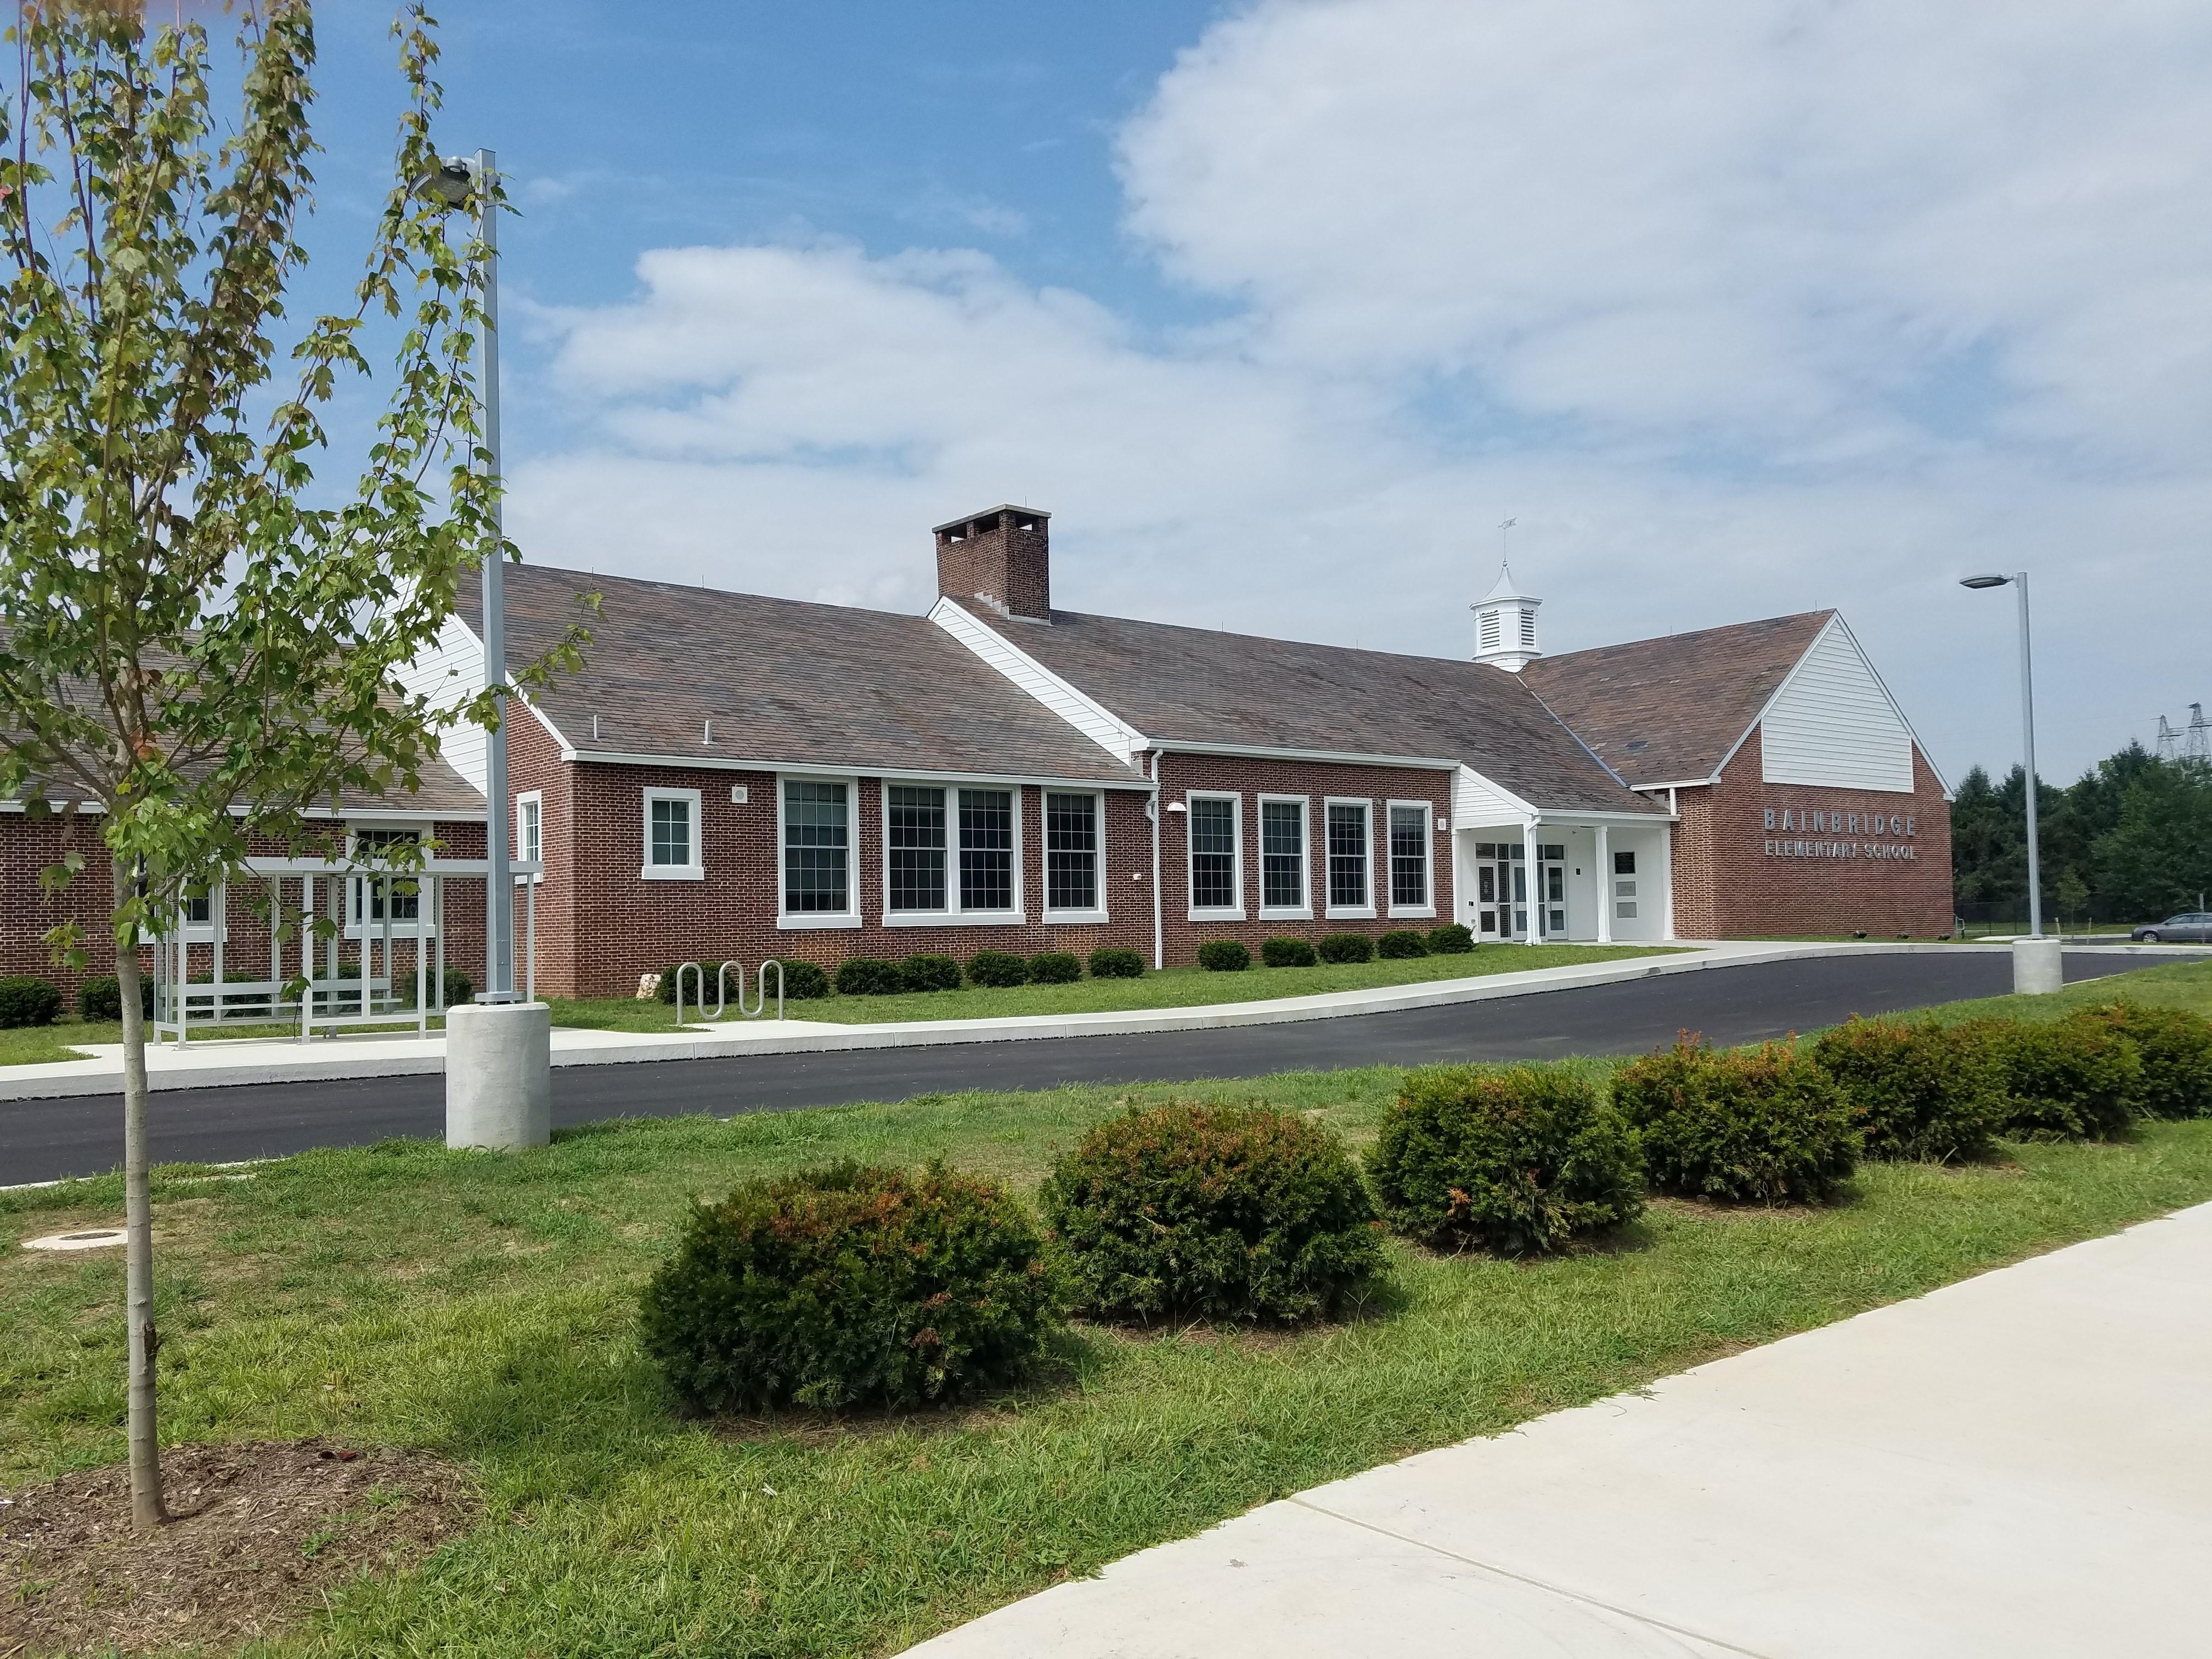 Bainbridge Elementary School